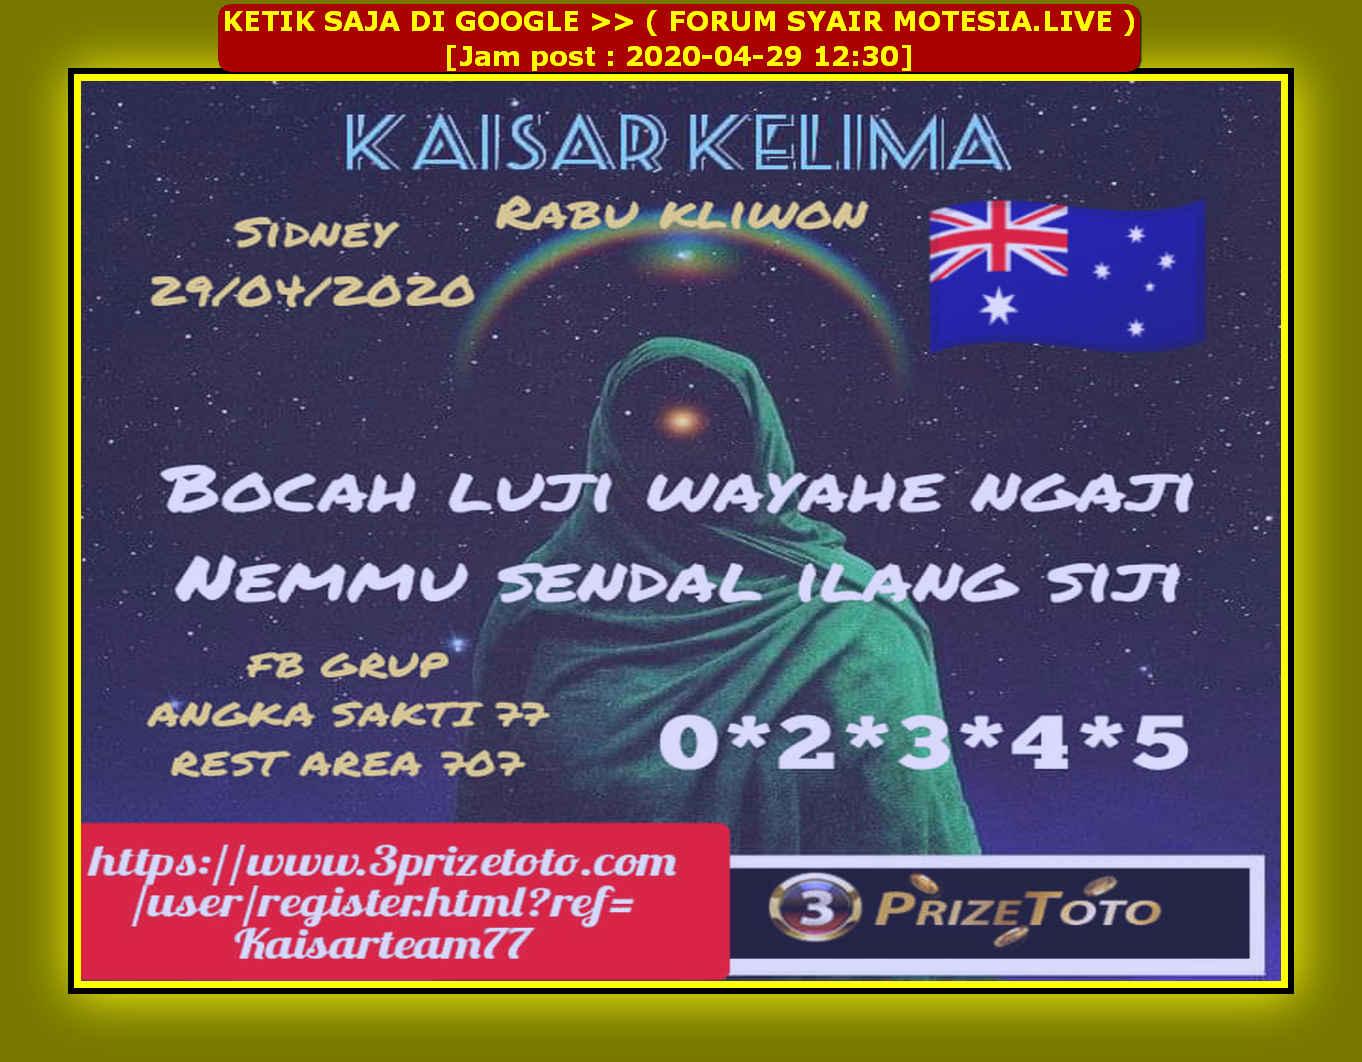 Kode syair Sydney Rabu 29 April 2020 16